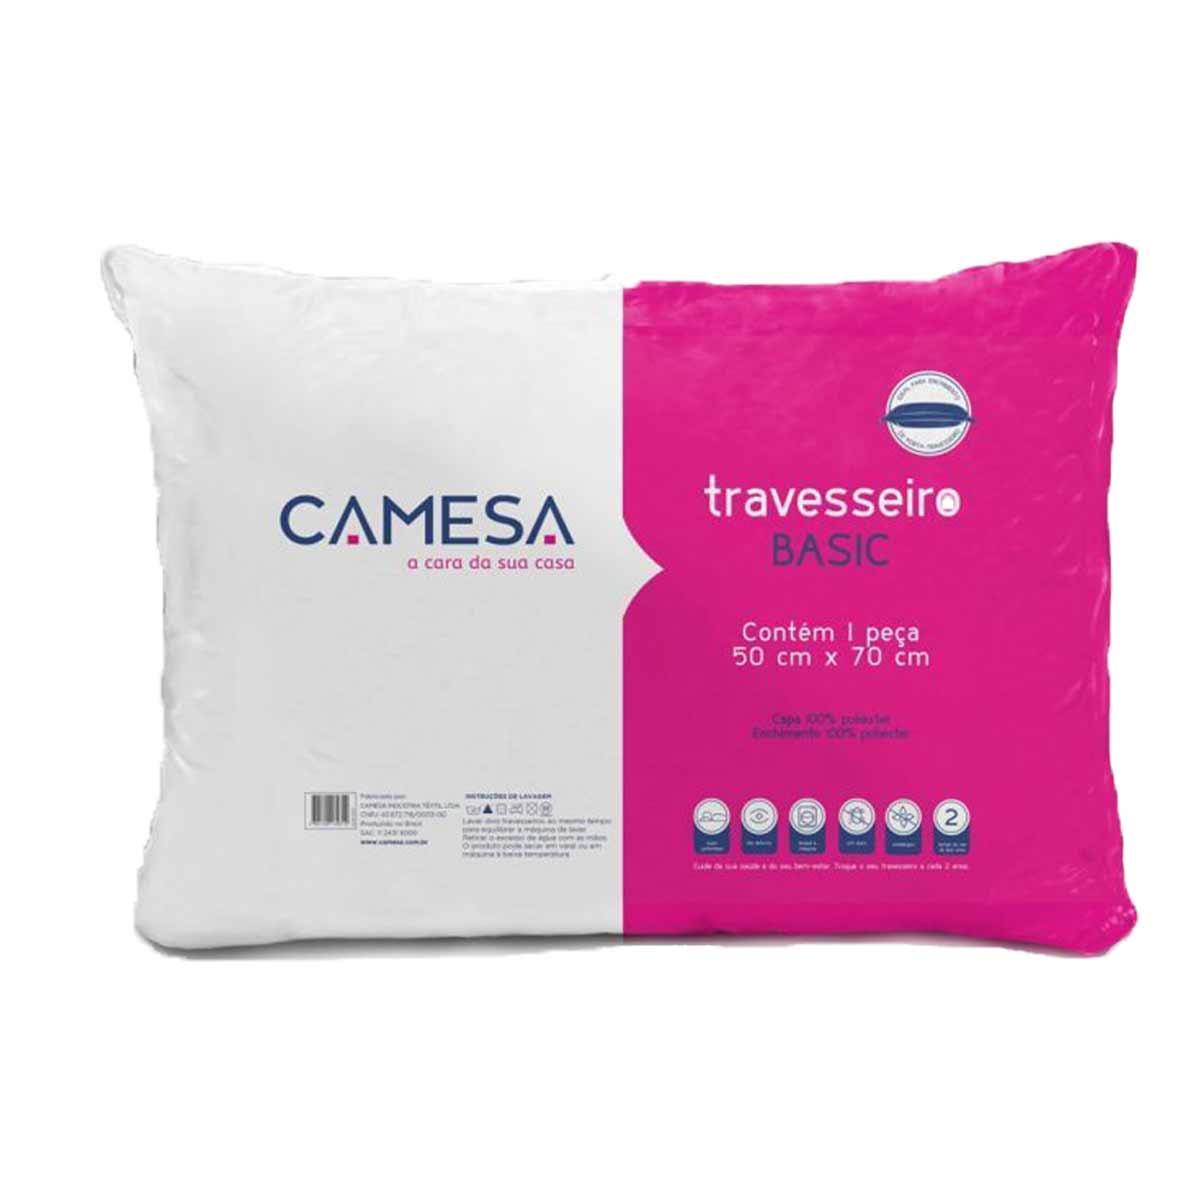 Travesseiro Modelo Básico Antialérgico 50 x 70 Camesa